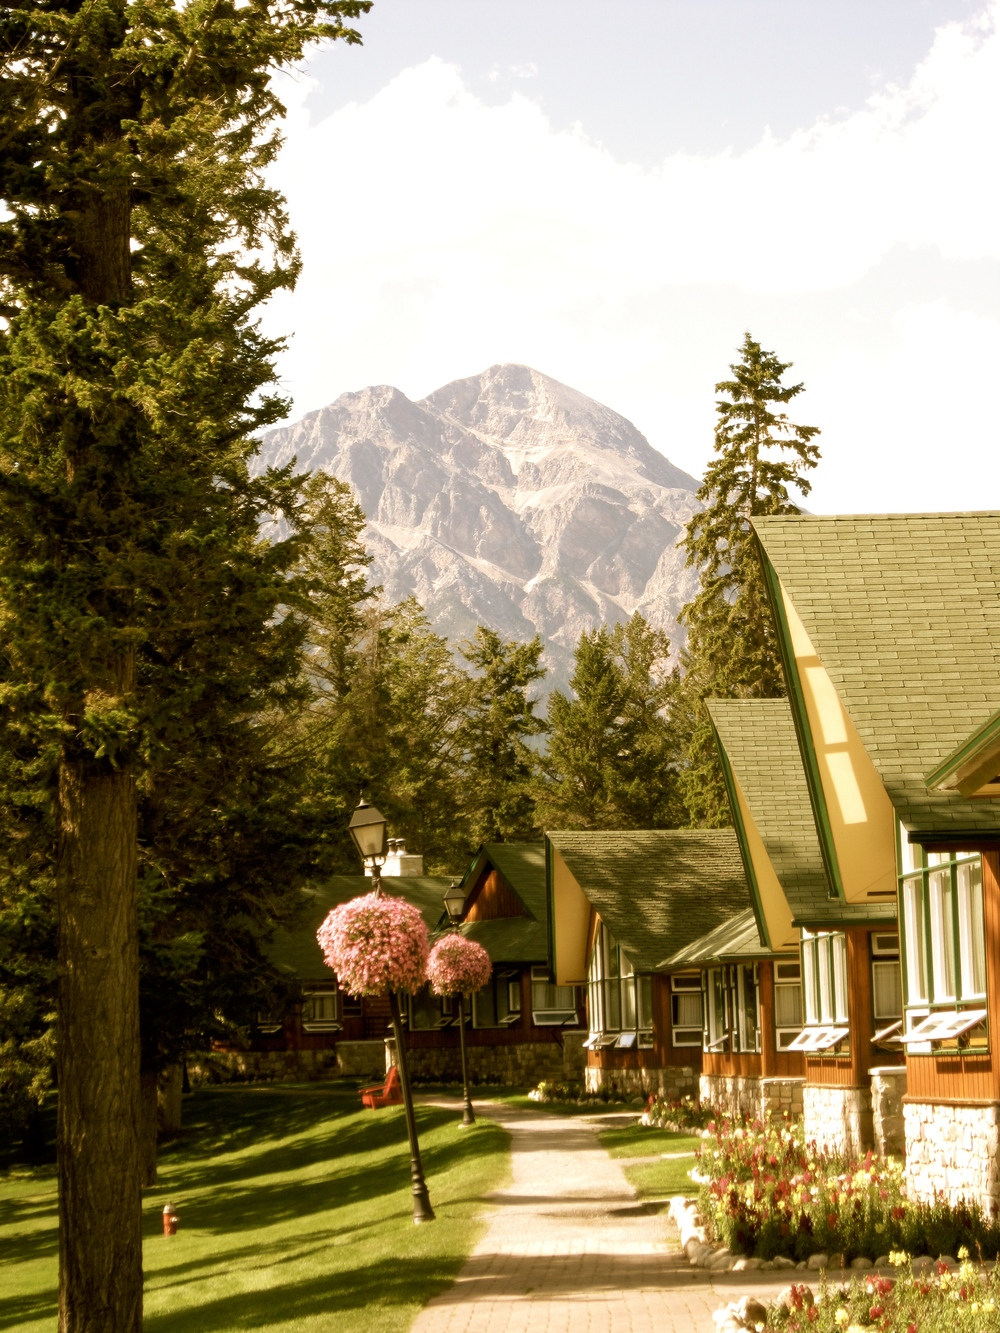 The lakeside chalets at the historic Farimont Jasper Park Lodge in Jasper, Alberta, Canada